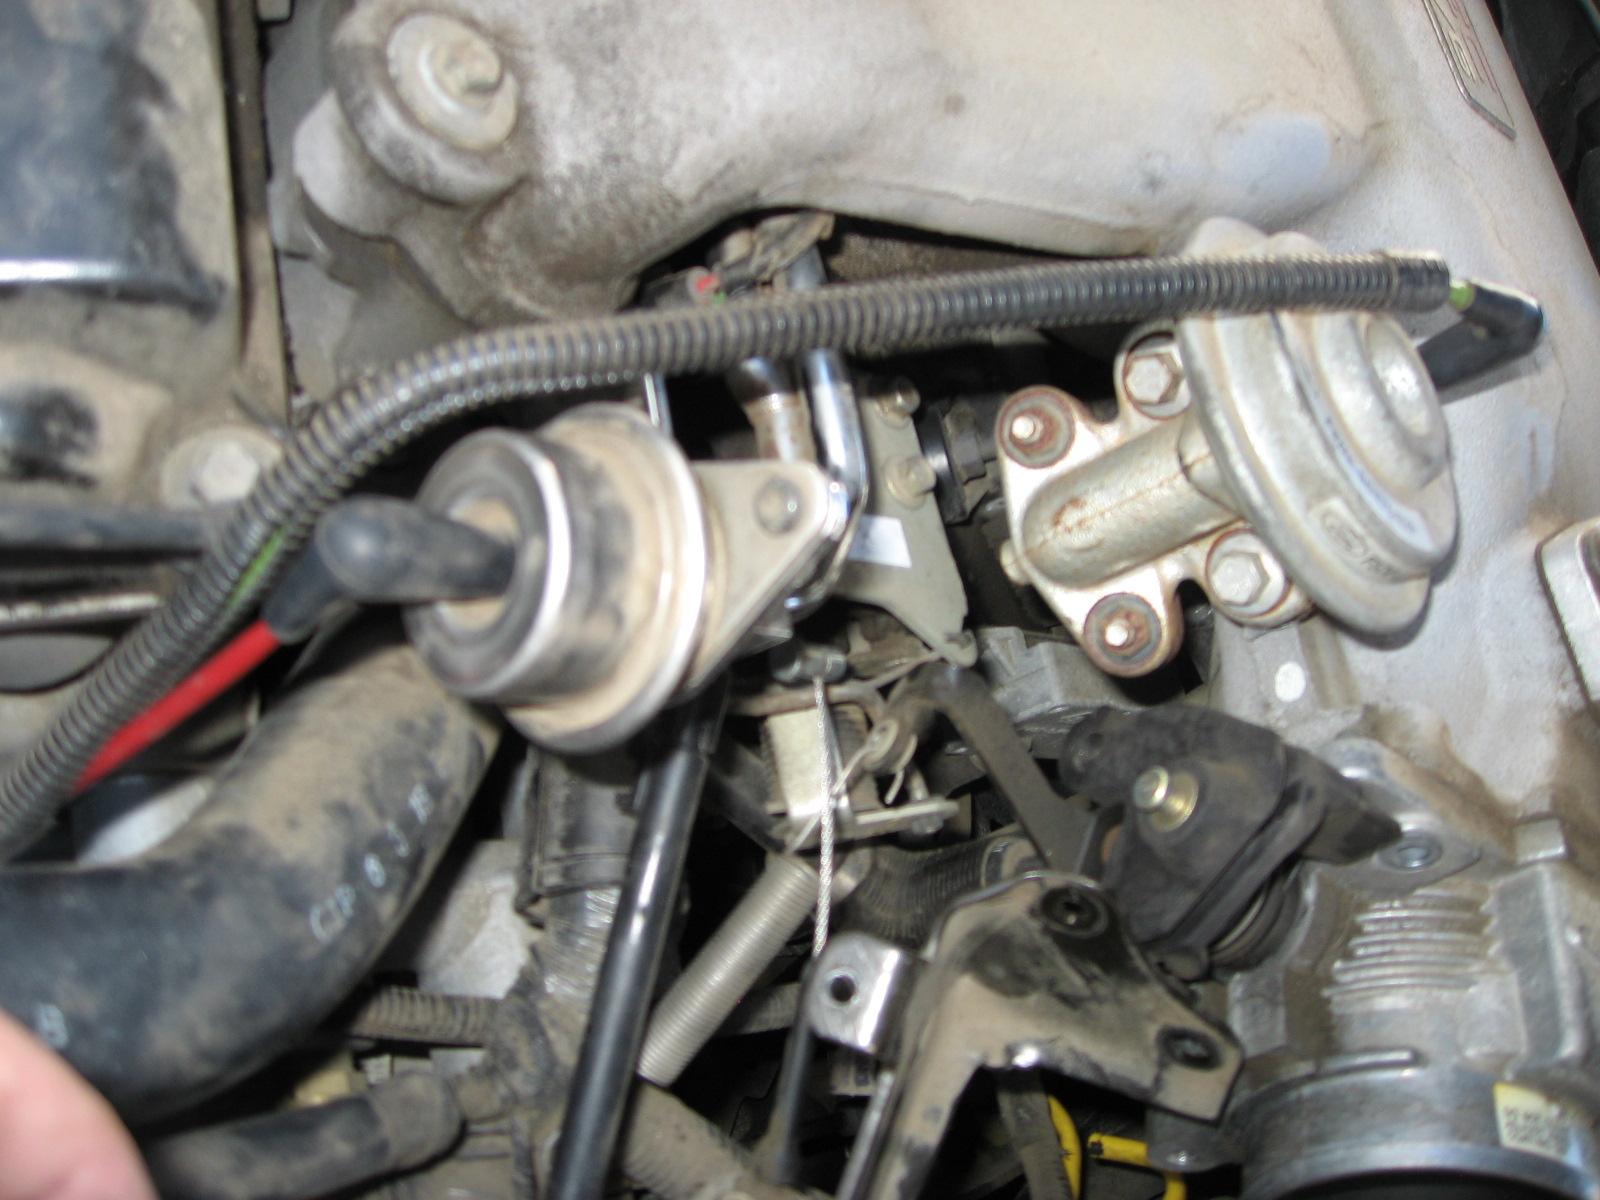 Ahr0cdp8fhd3ml5qdxn0yw5zd2vyxmnvbxx1cgxvywrzfhm0mjb8mjaxmc0xms0ymv8ymdu0ntdfmdjfdgf1cnvzx3dpcgvyx3jlbgf5xm zw additionally Ford Window Motor Bushing moreover 95 F150 Stereo Wiring Diagram besides Page37 further 5p0nw Ford F 250 Xl 2006 Model F 250 Will Not Switch. on windstar window motor replacement